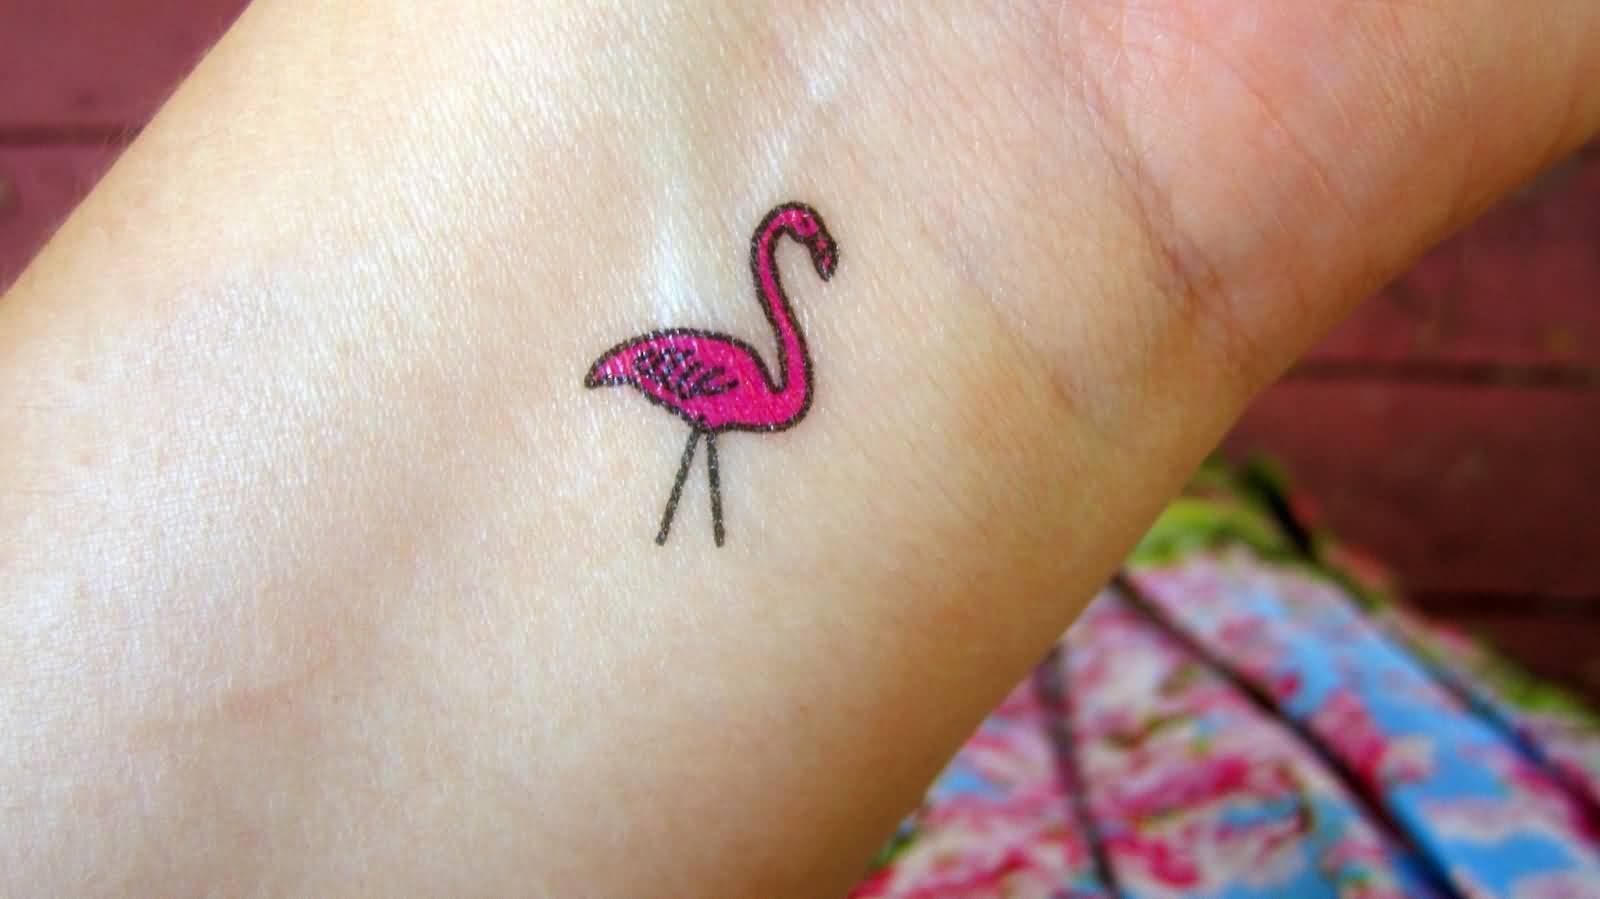 dfe2d1044 Smallest Nice Flamingo Tattoo On Wrist